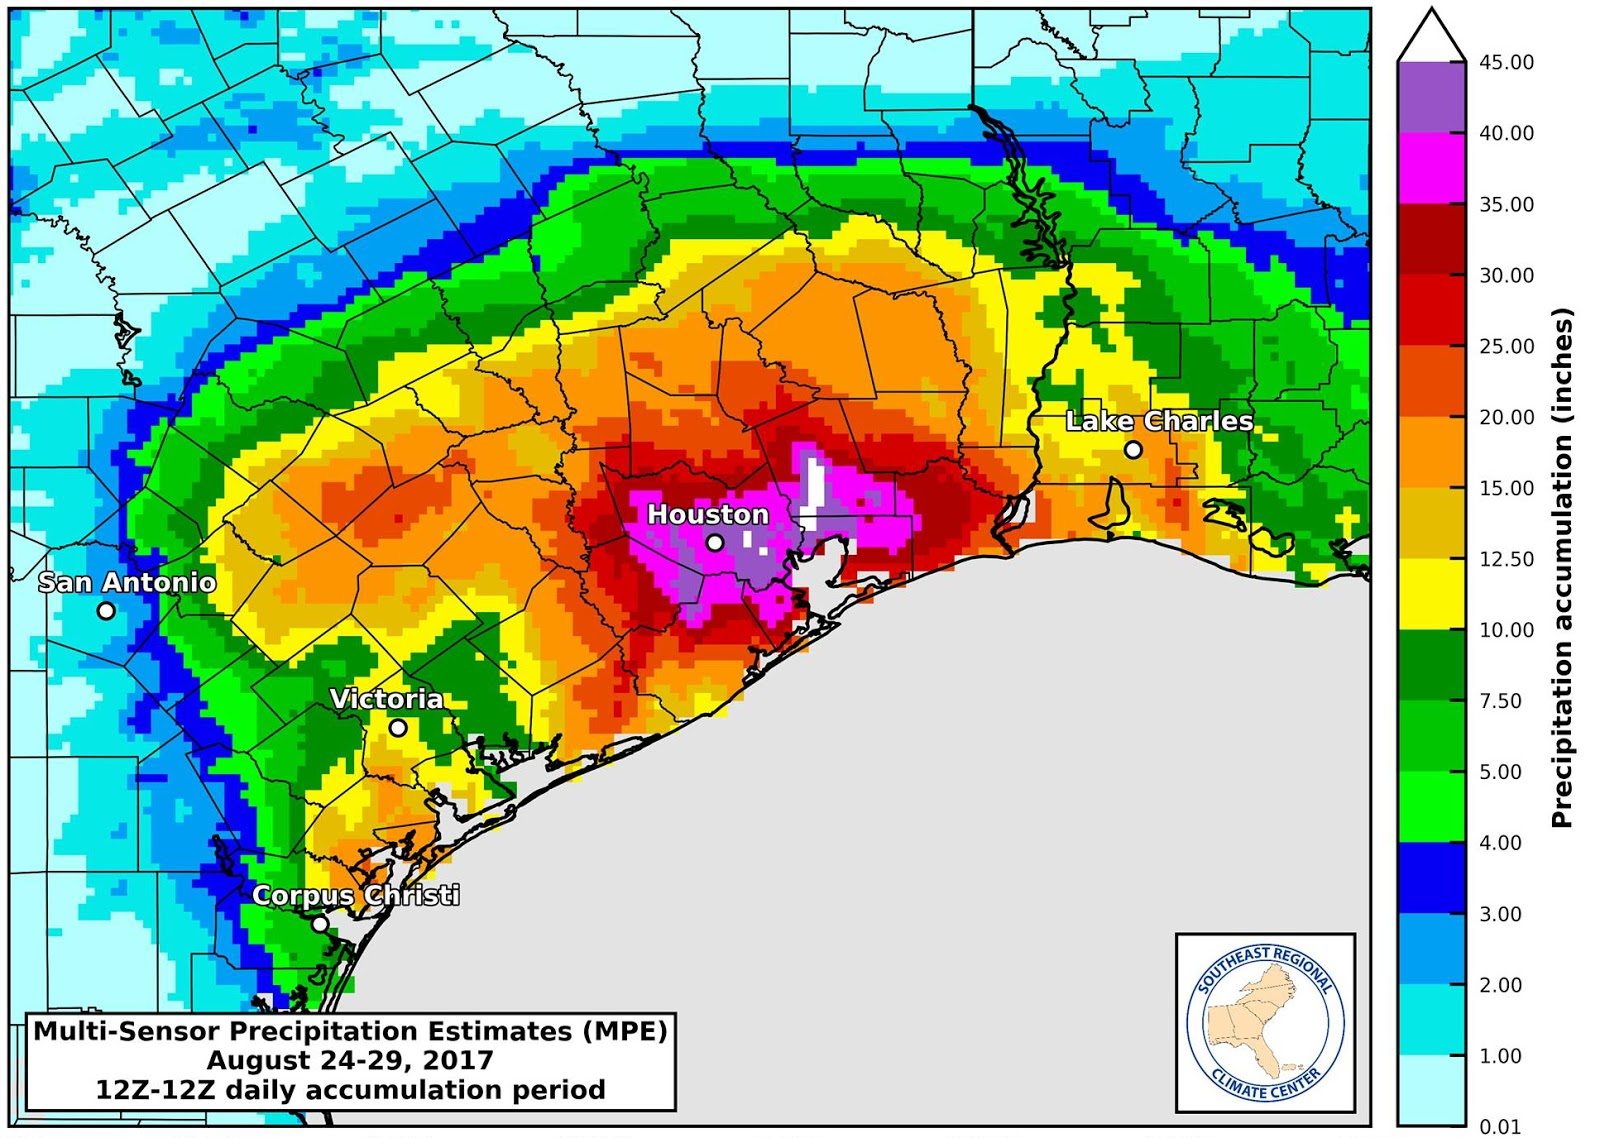 Rain Totals Map Tropical Atlantic Update: Maps of rainfall totals in Texas look  Rain Totals Map